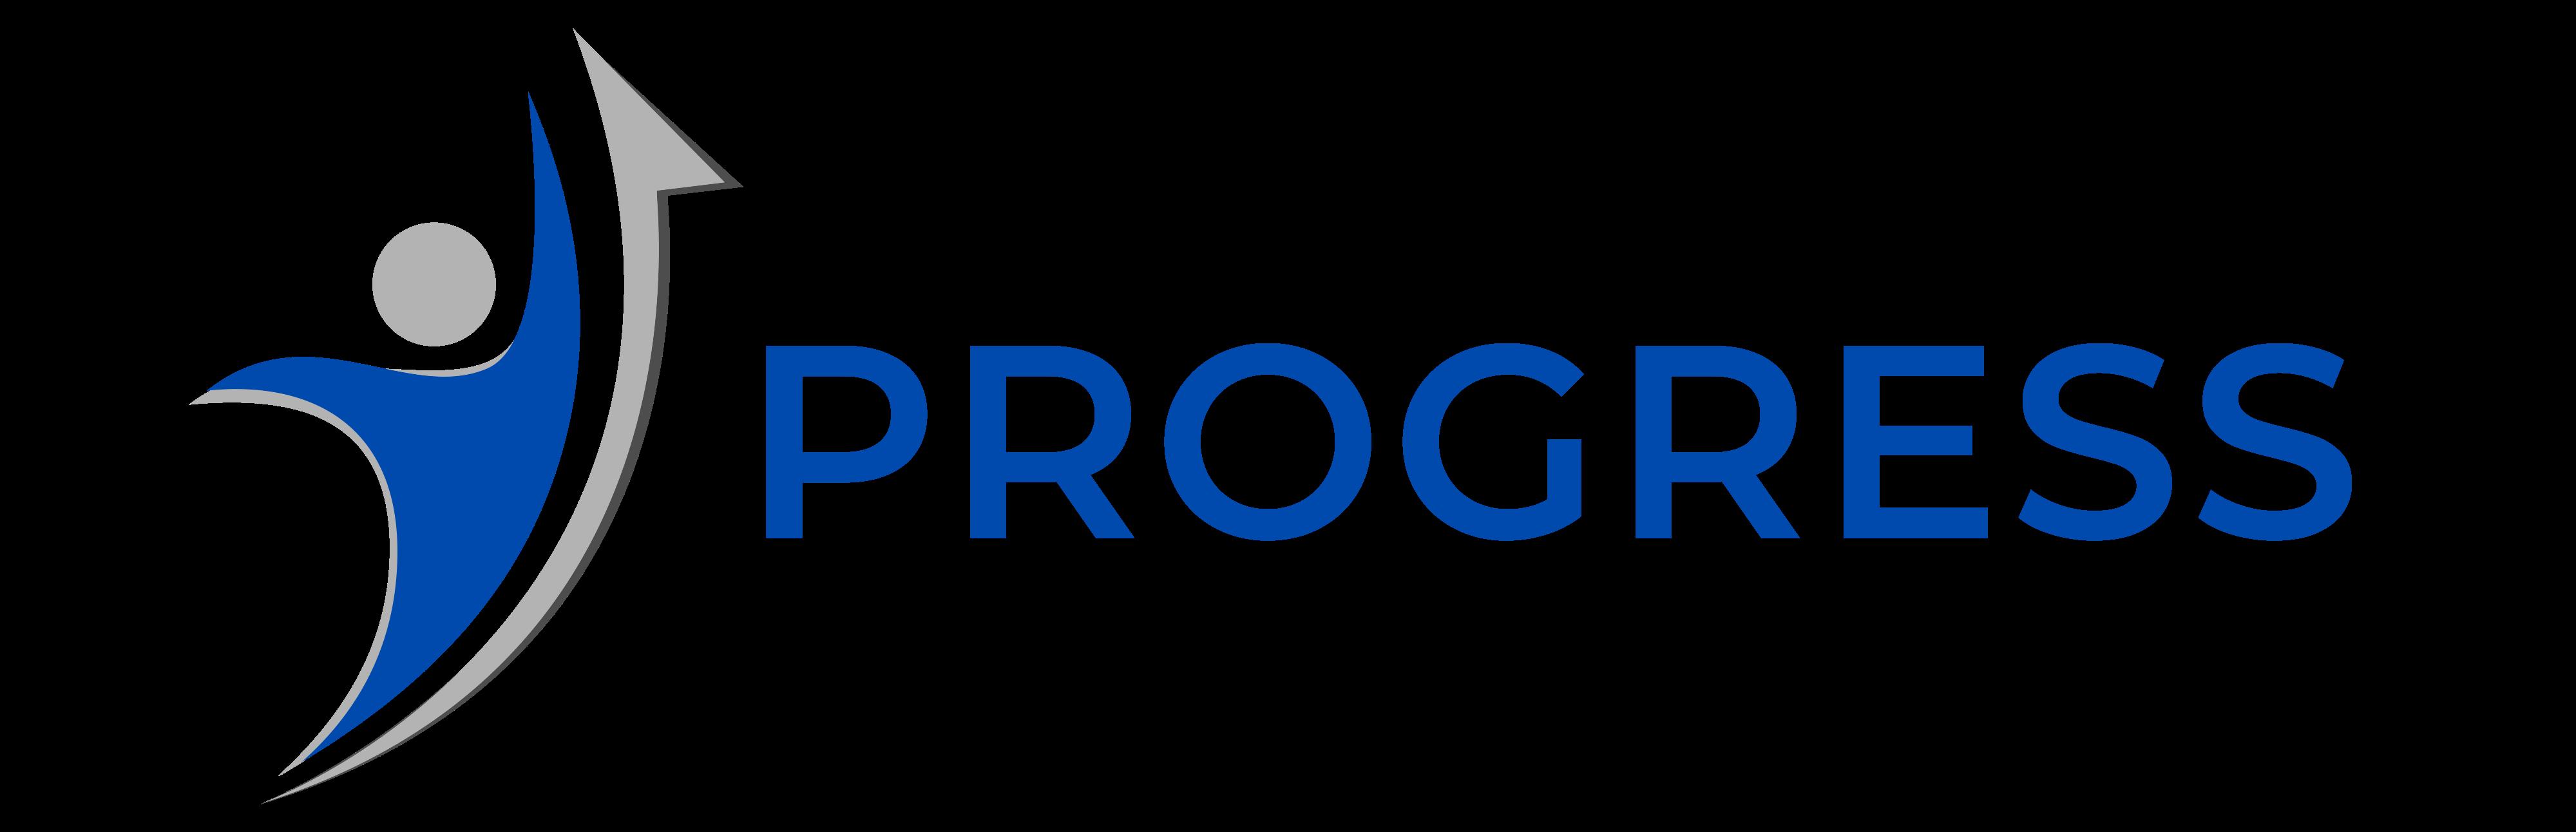 PROGRESS online